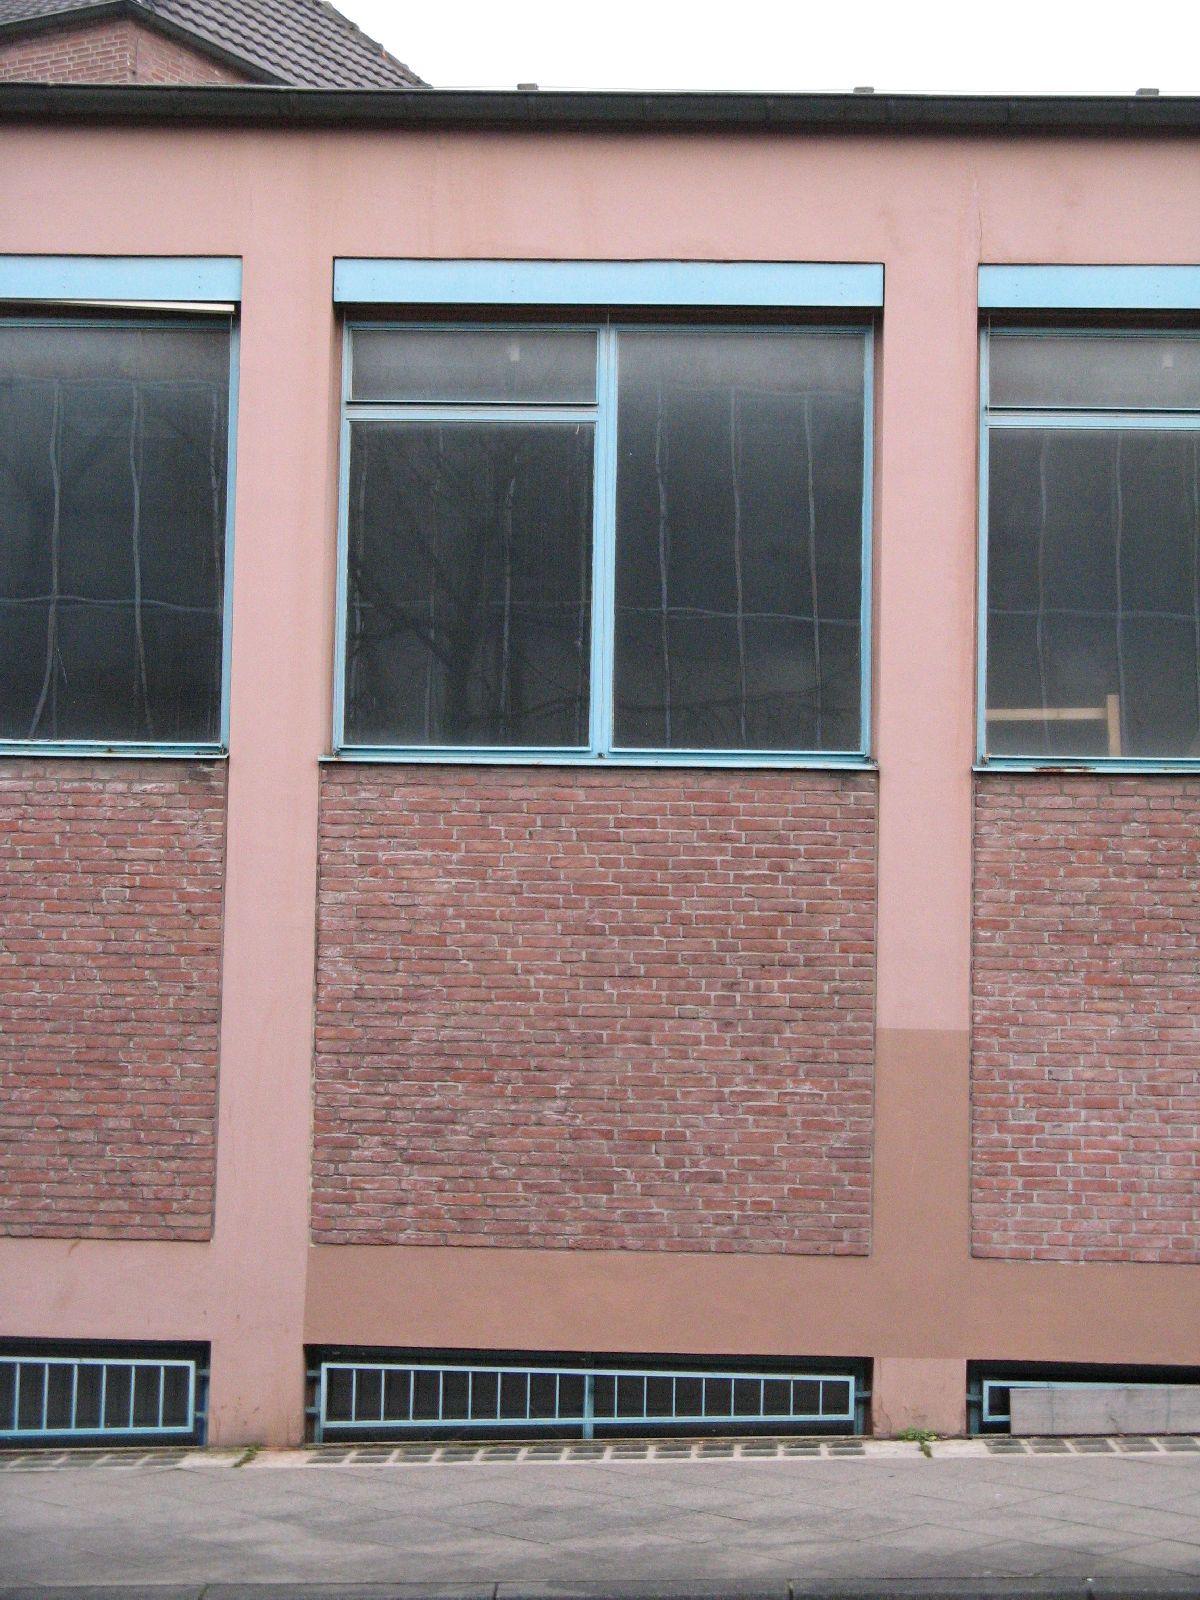 Building_Texture_B_2564